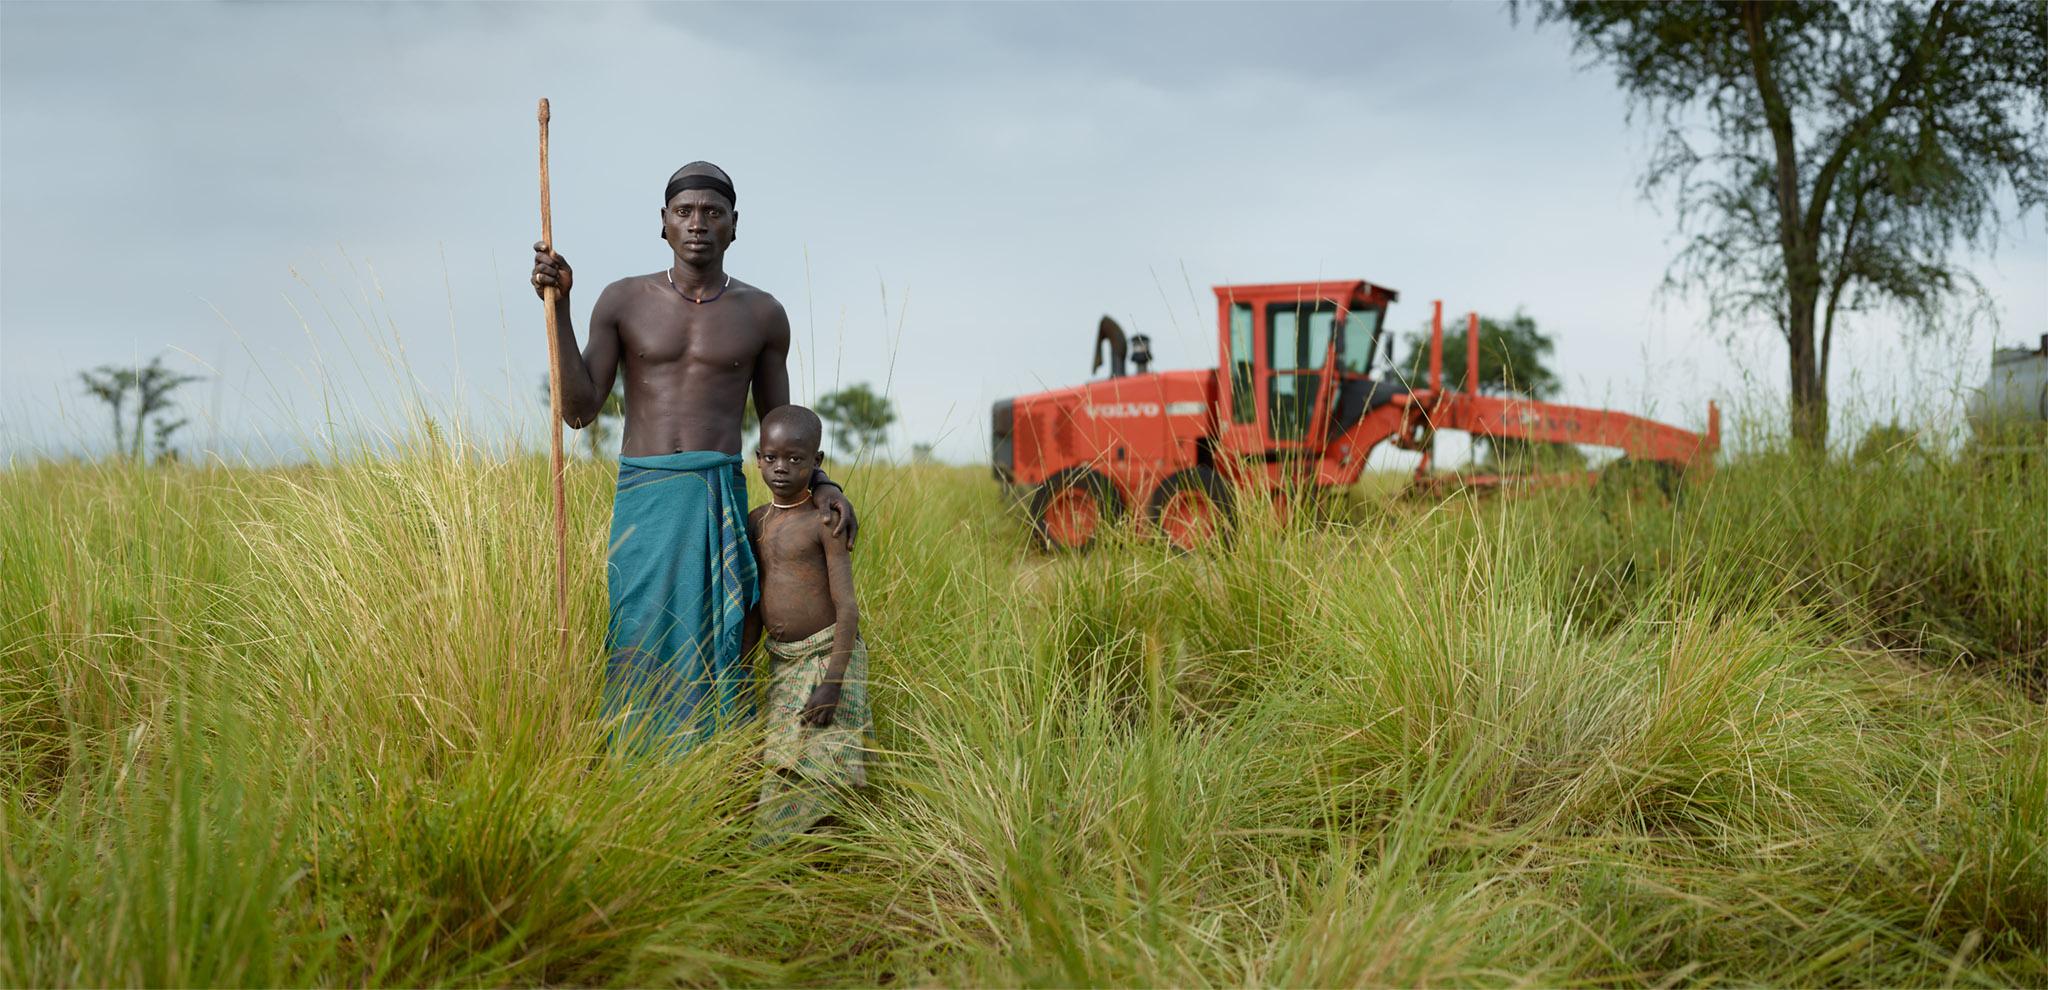 Geri Botulu and Ganggang Geri with bulldozer. Bodi Me'en Tribe, Lower Omo Valley, Ethiopia